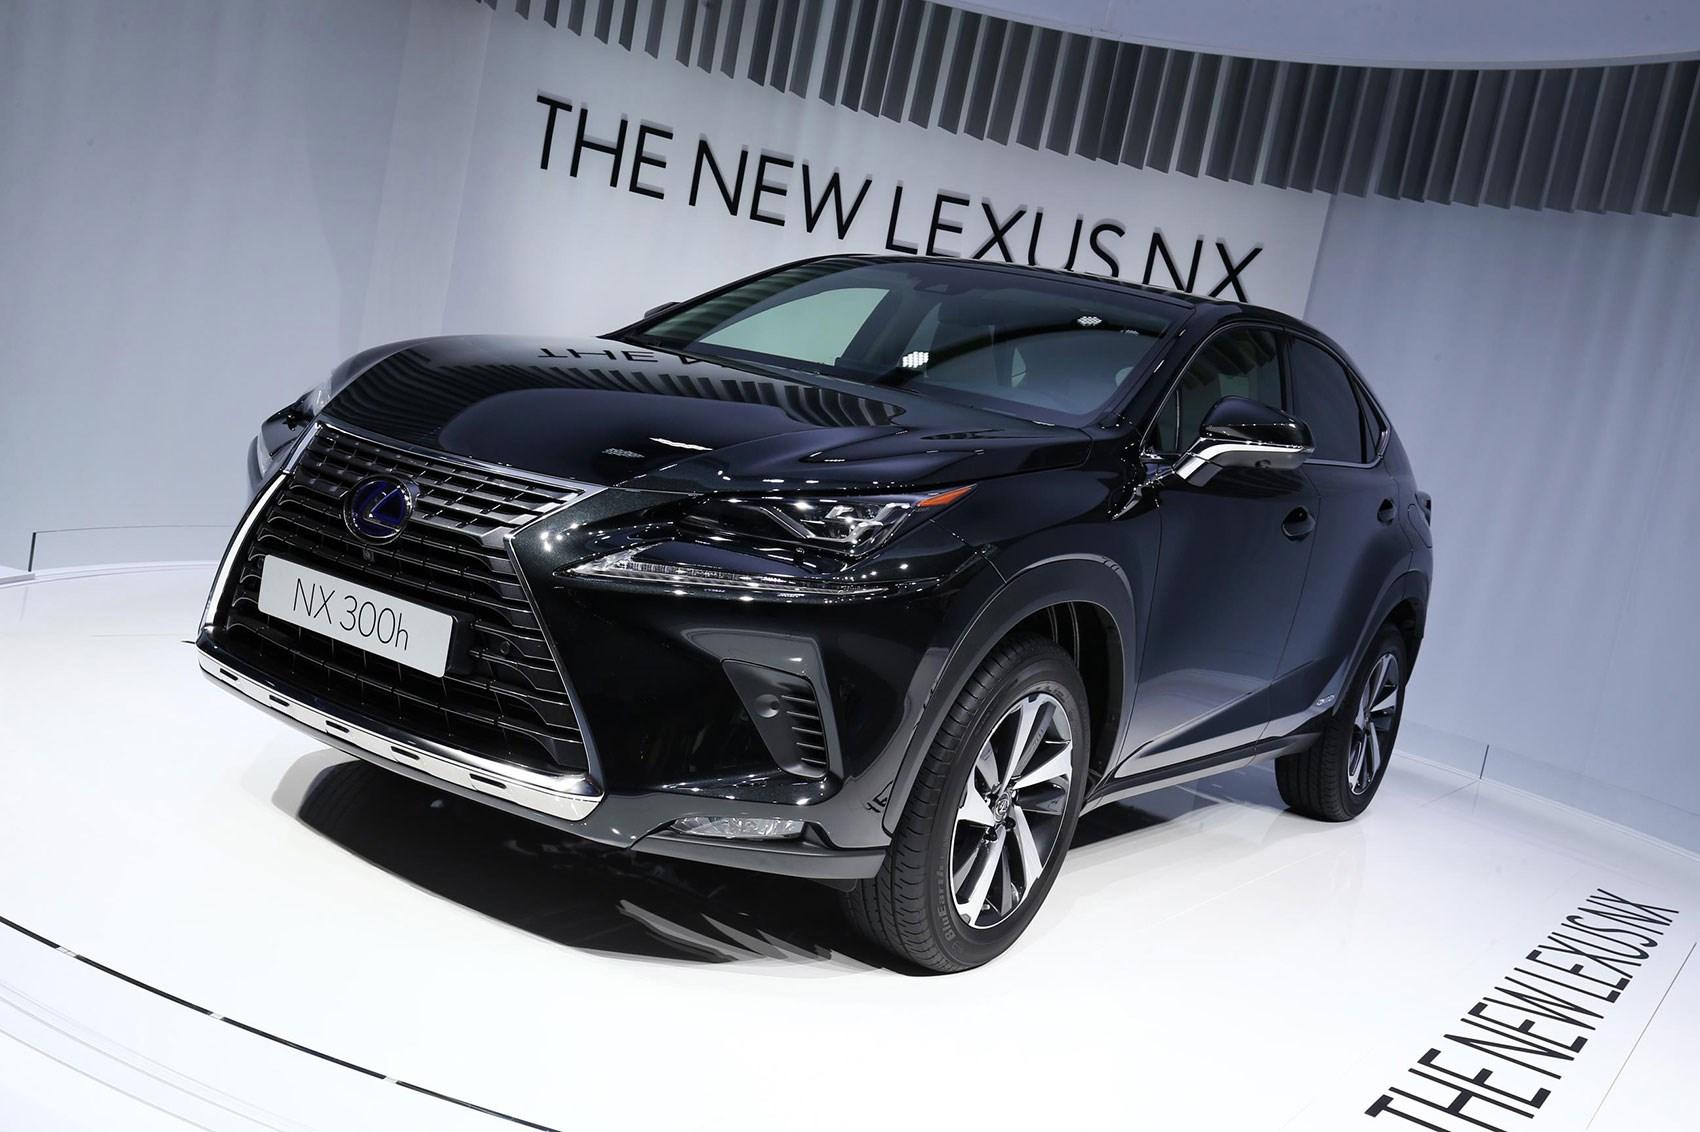 Lexus Nx Facelift At 2017 Frankfurt Motor Show Pictures Specs